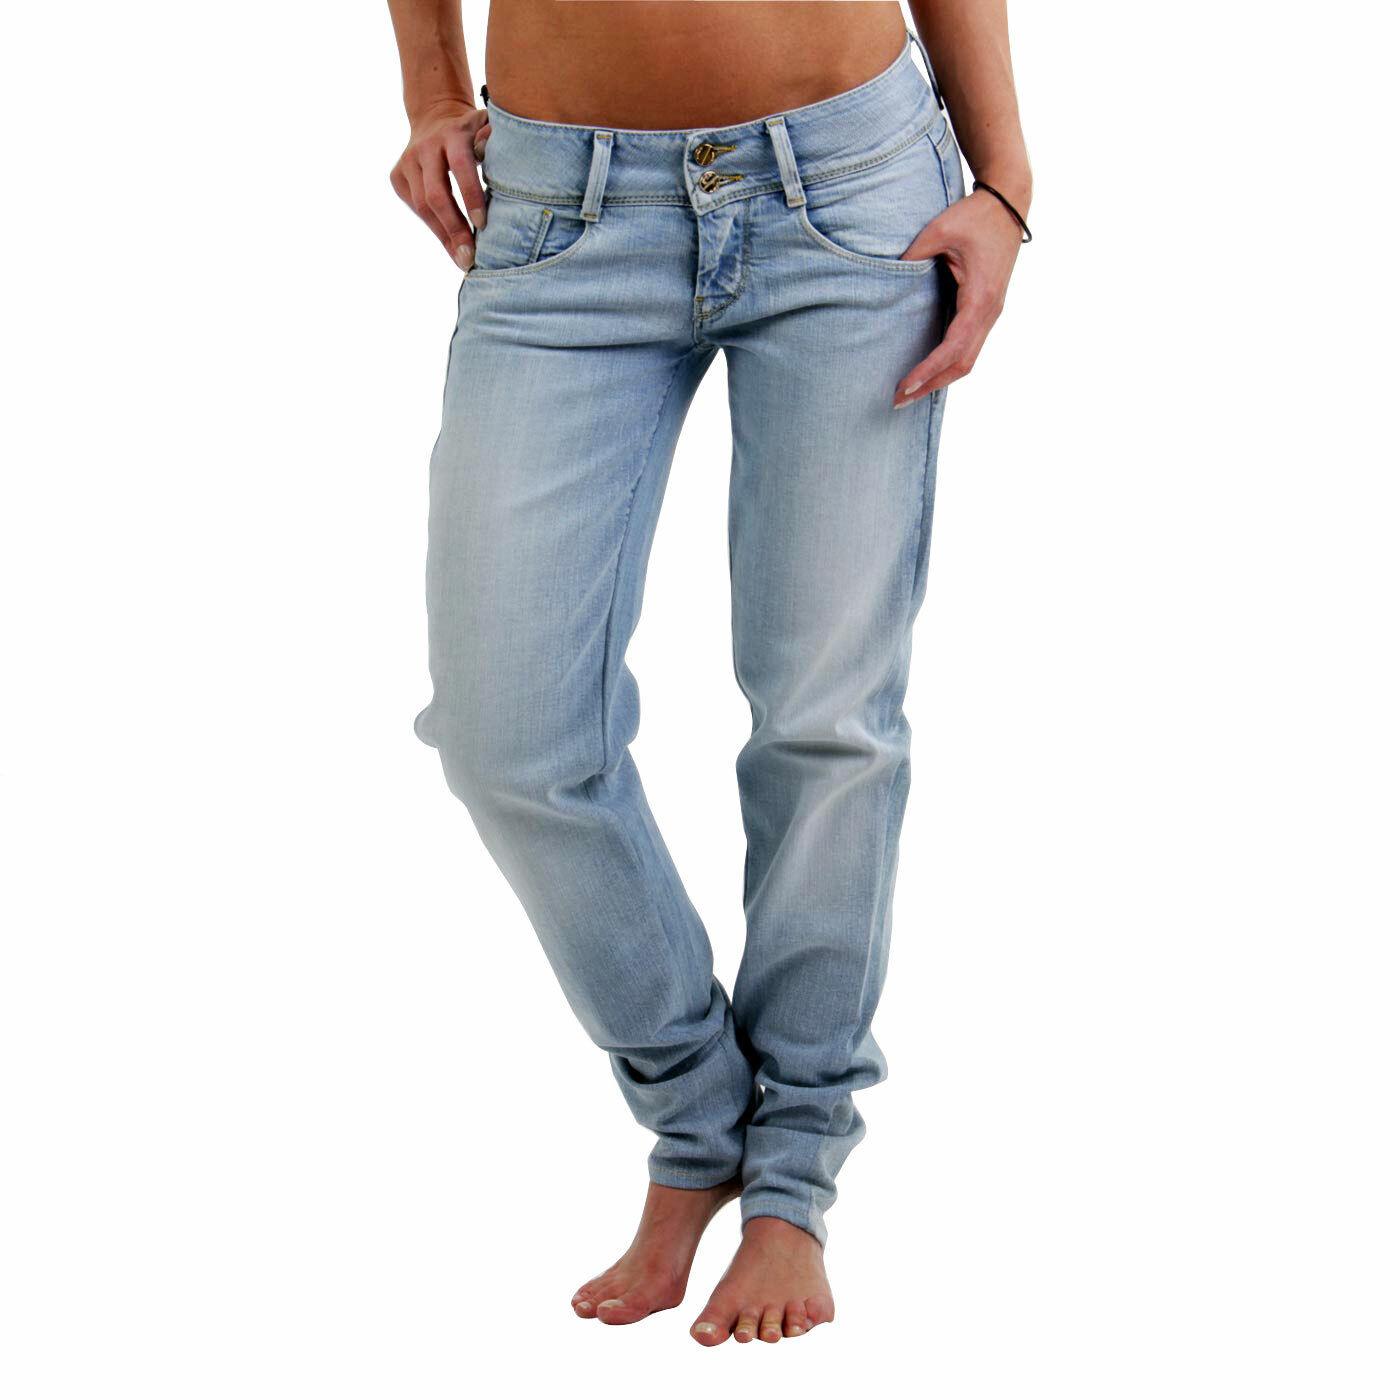 NOLITA Damen Jeans Harems Hose Danielle Trousers Blue | eBay